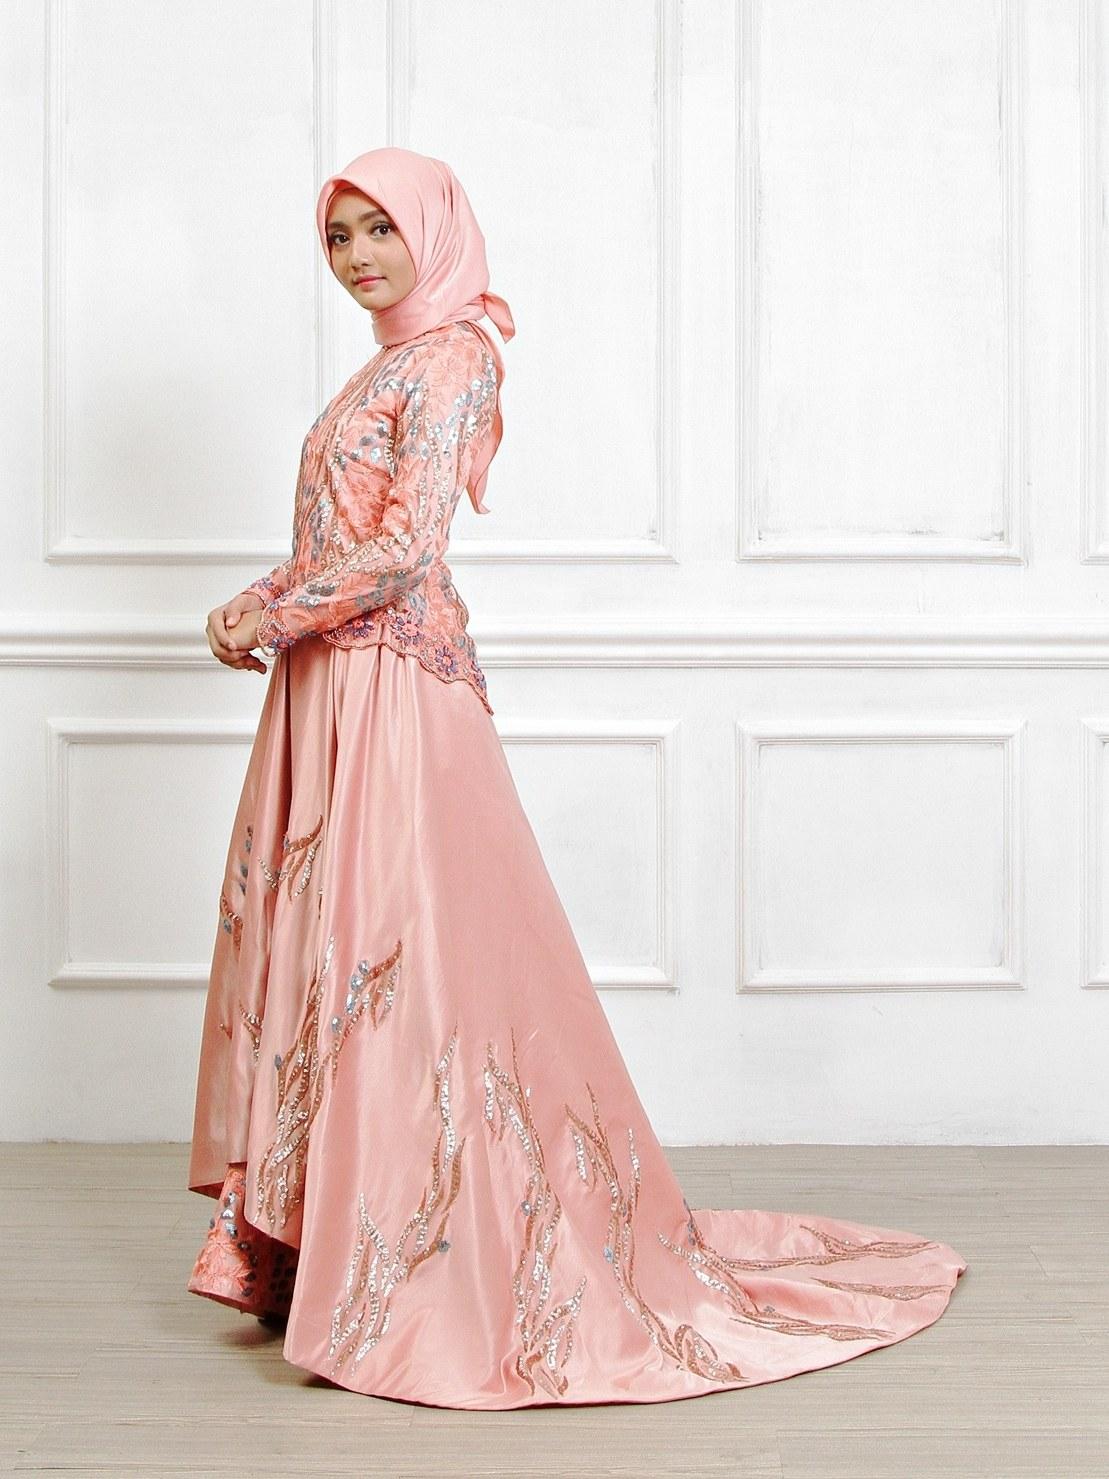 Model Sewa Gaun Pengantin Muslimah Modern H9d9 Gaun Pengantin Muslimah Dress Muslim Pungky Rumah Jahit